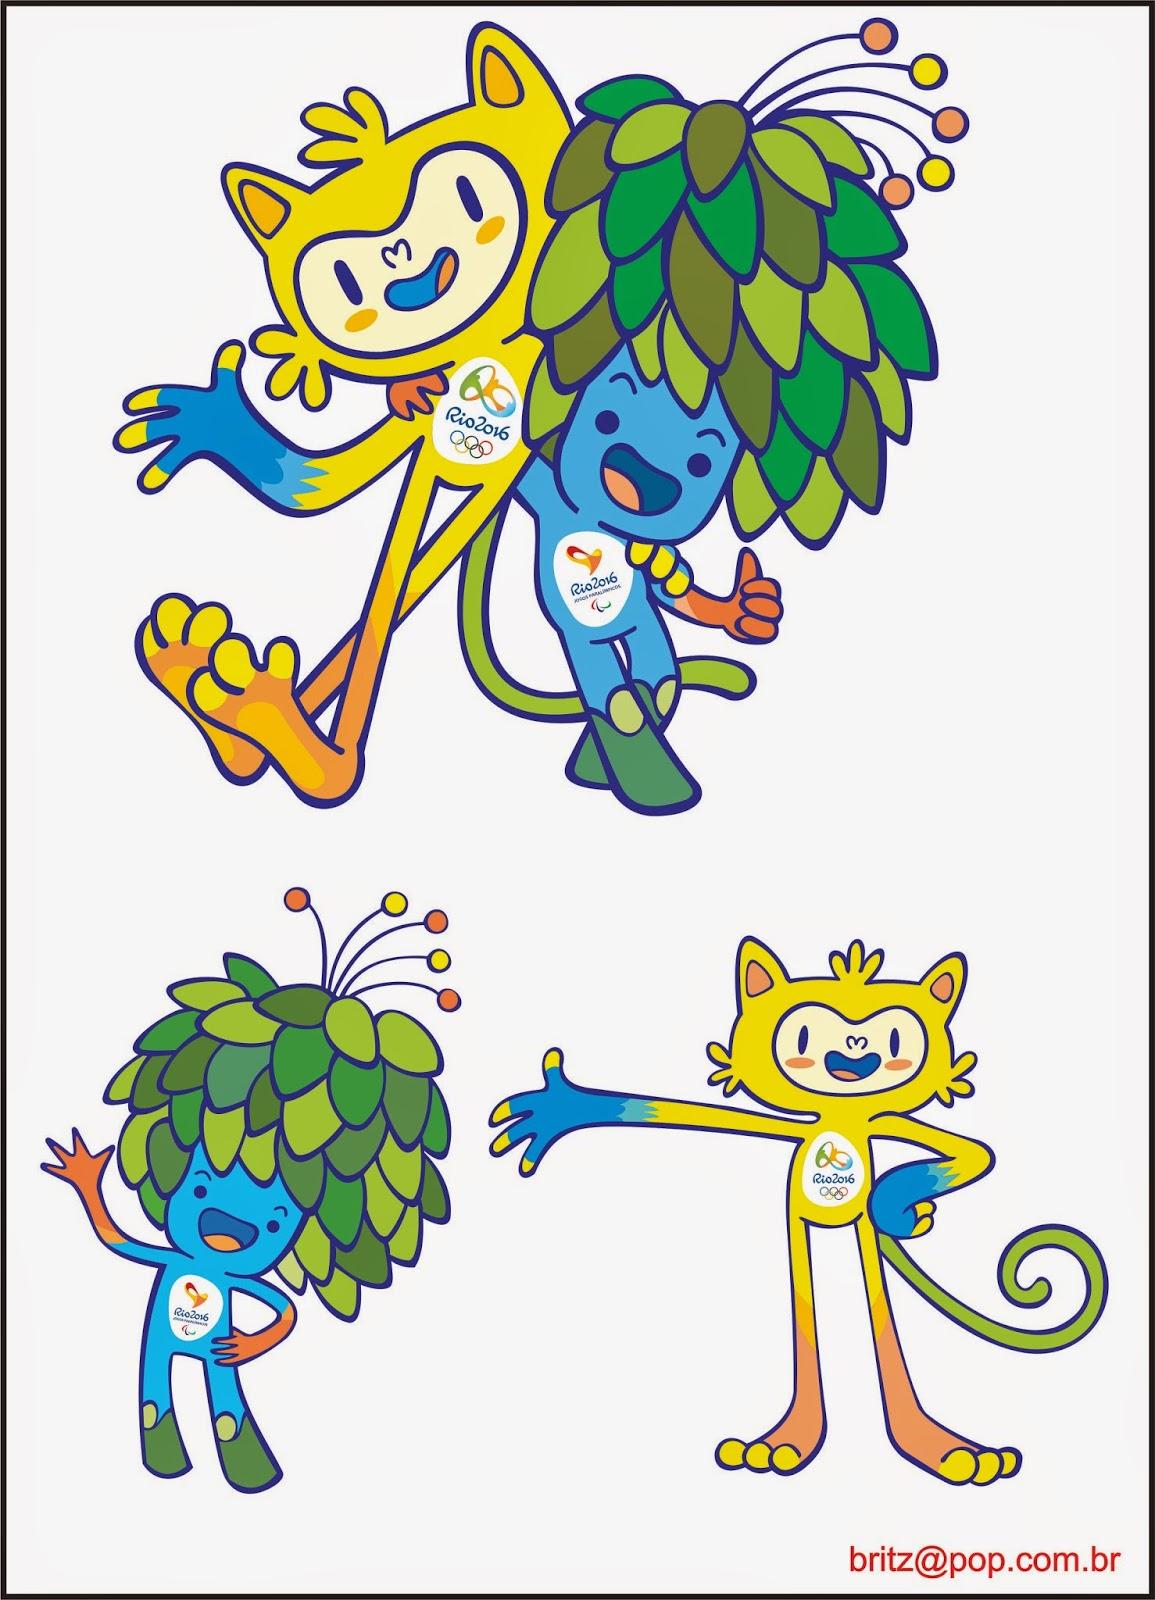 Mascotes-Rio 2016